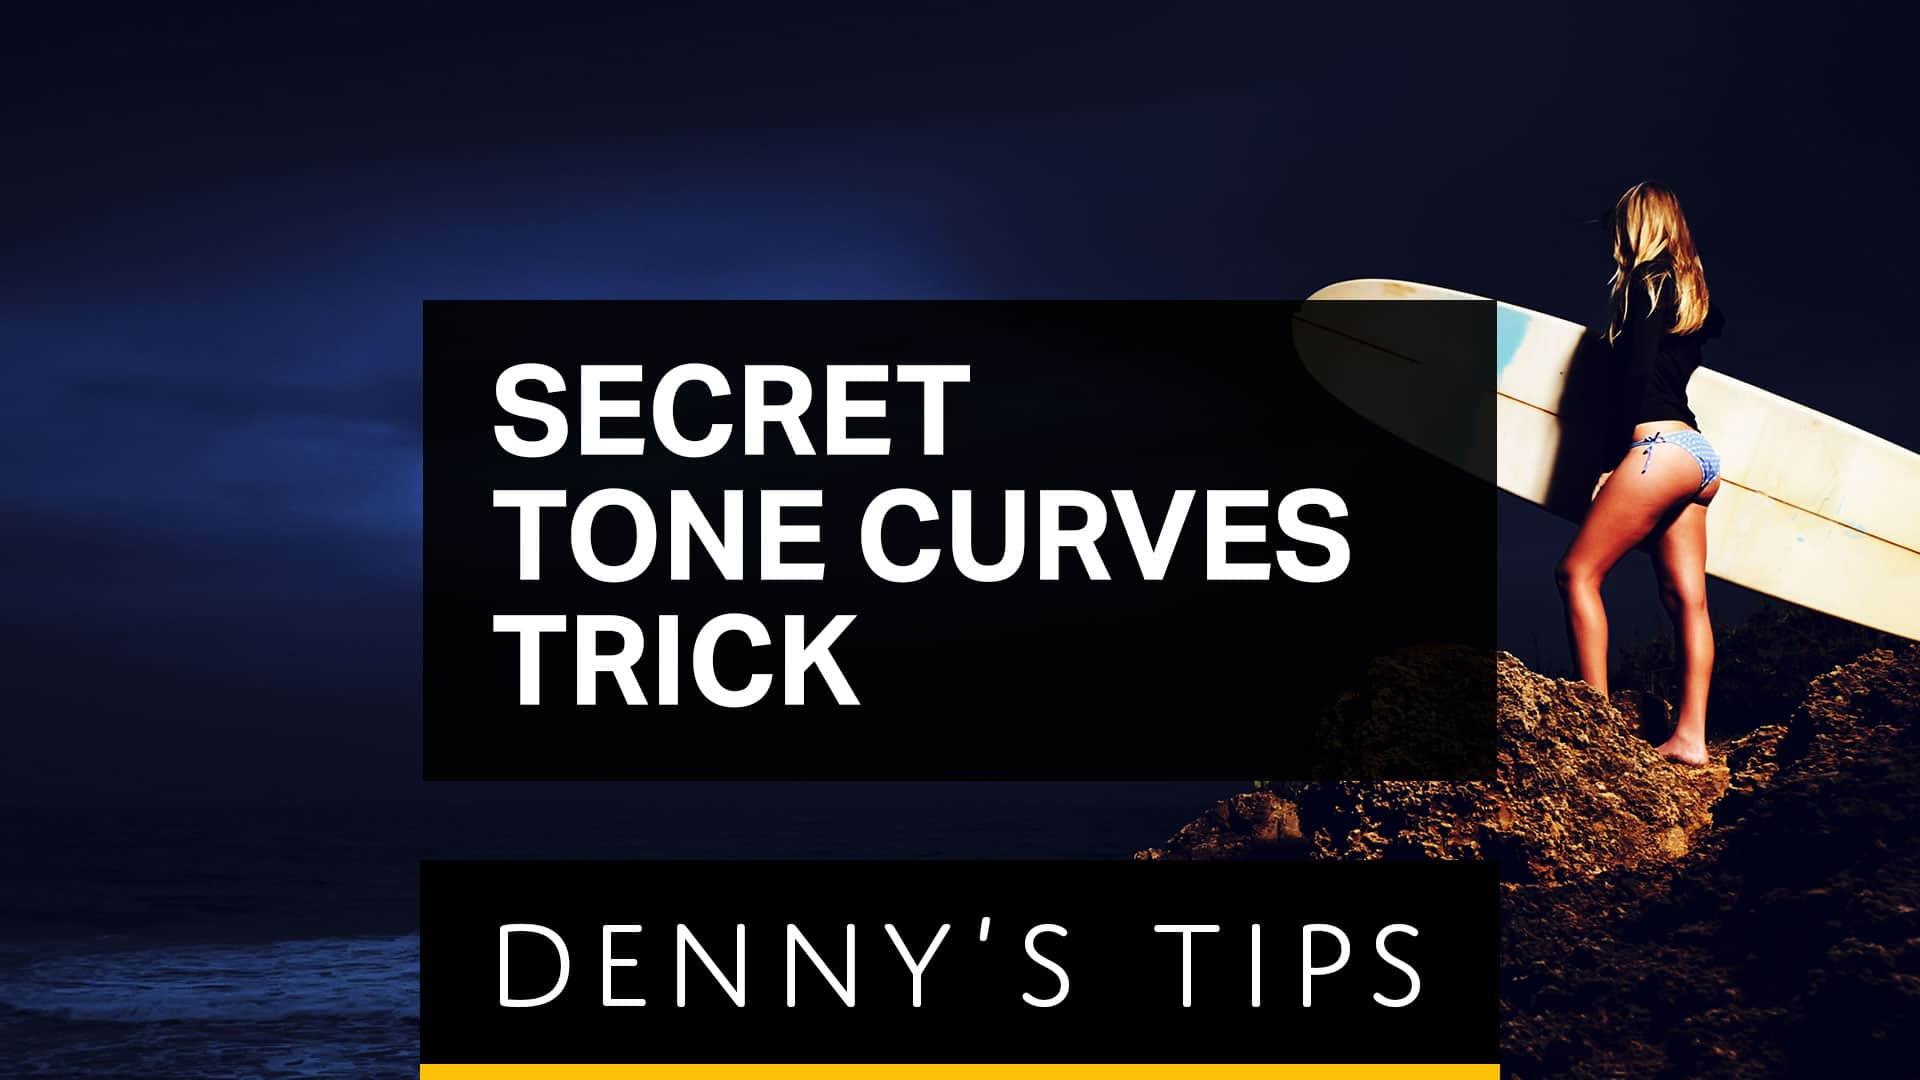 My Secret Tone Curves Trick